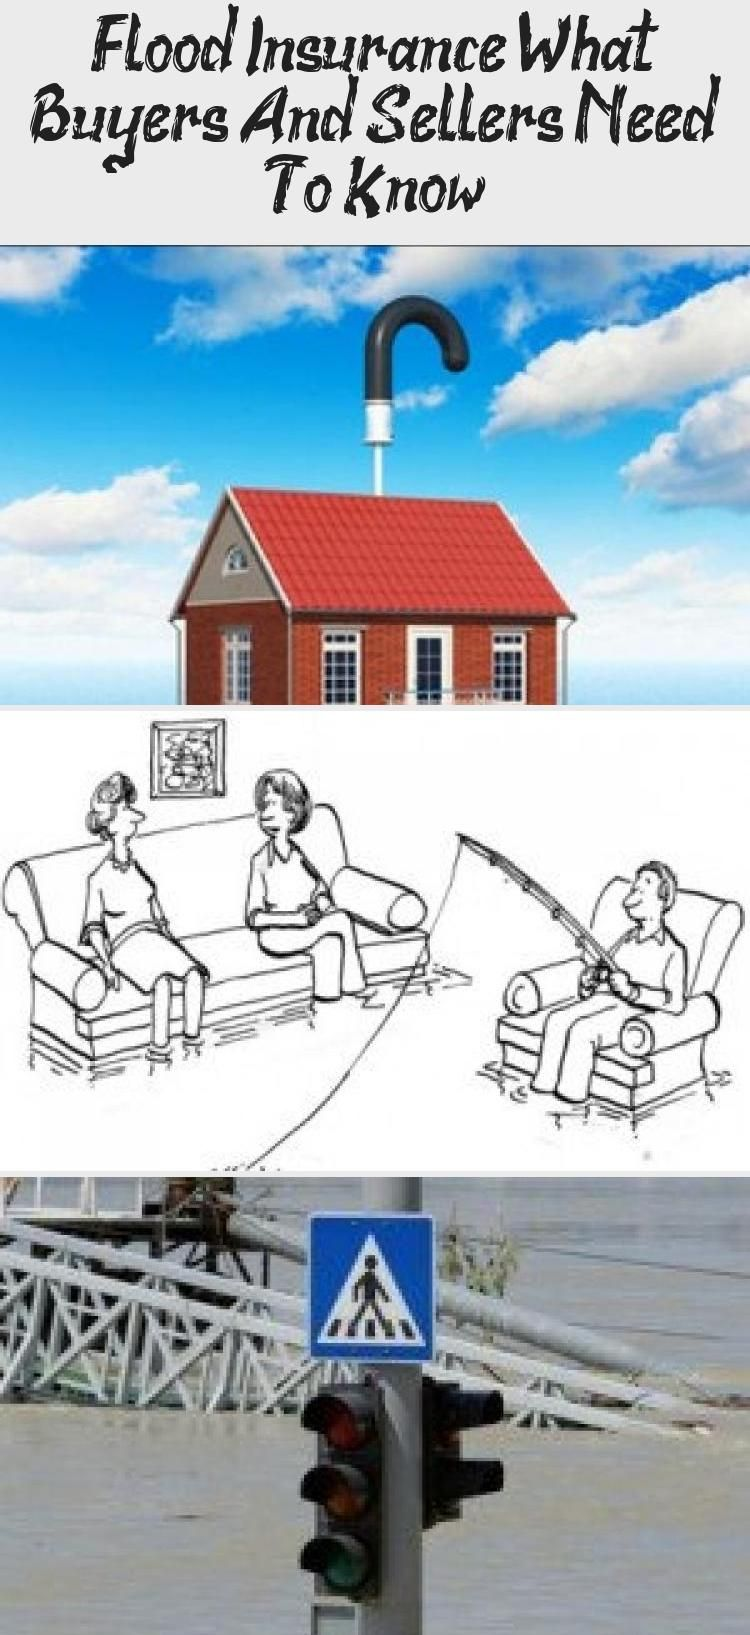 Businessinsurance insuranceArt insurancePolicy